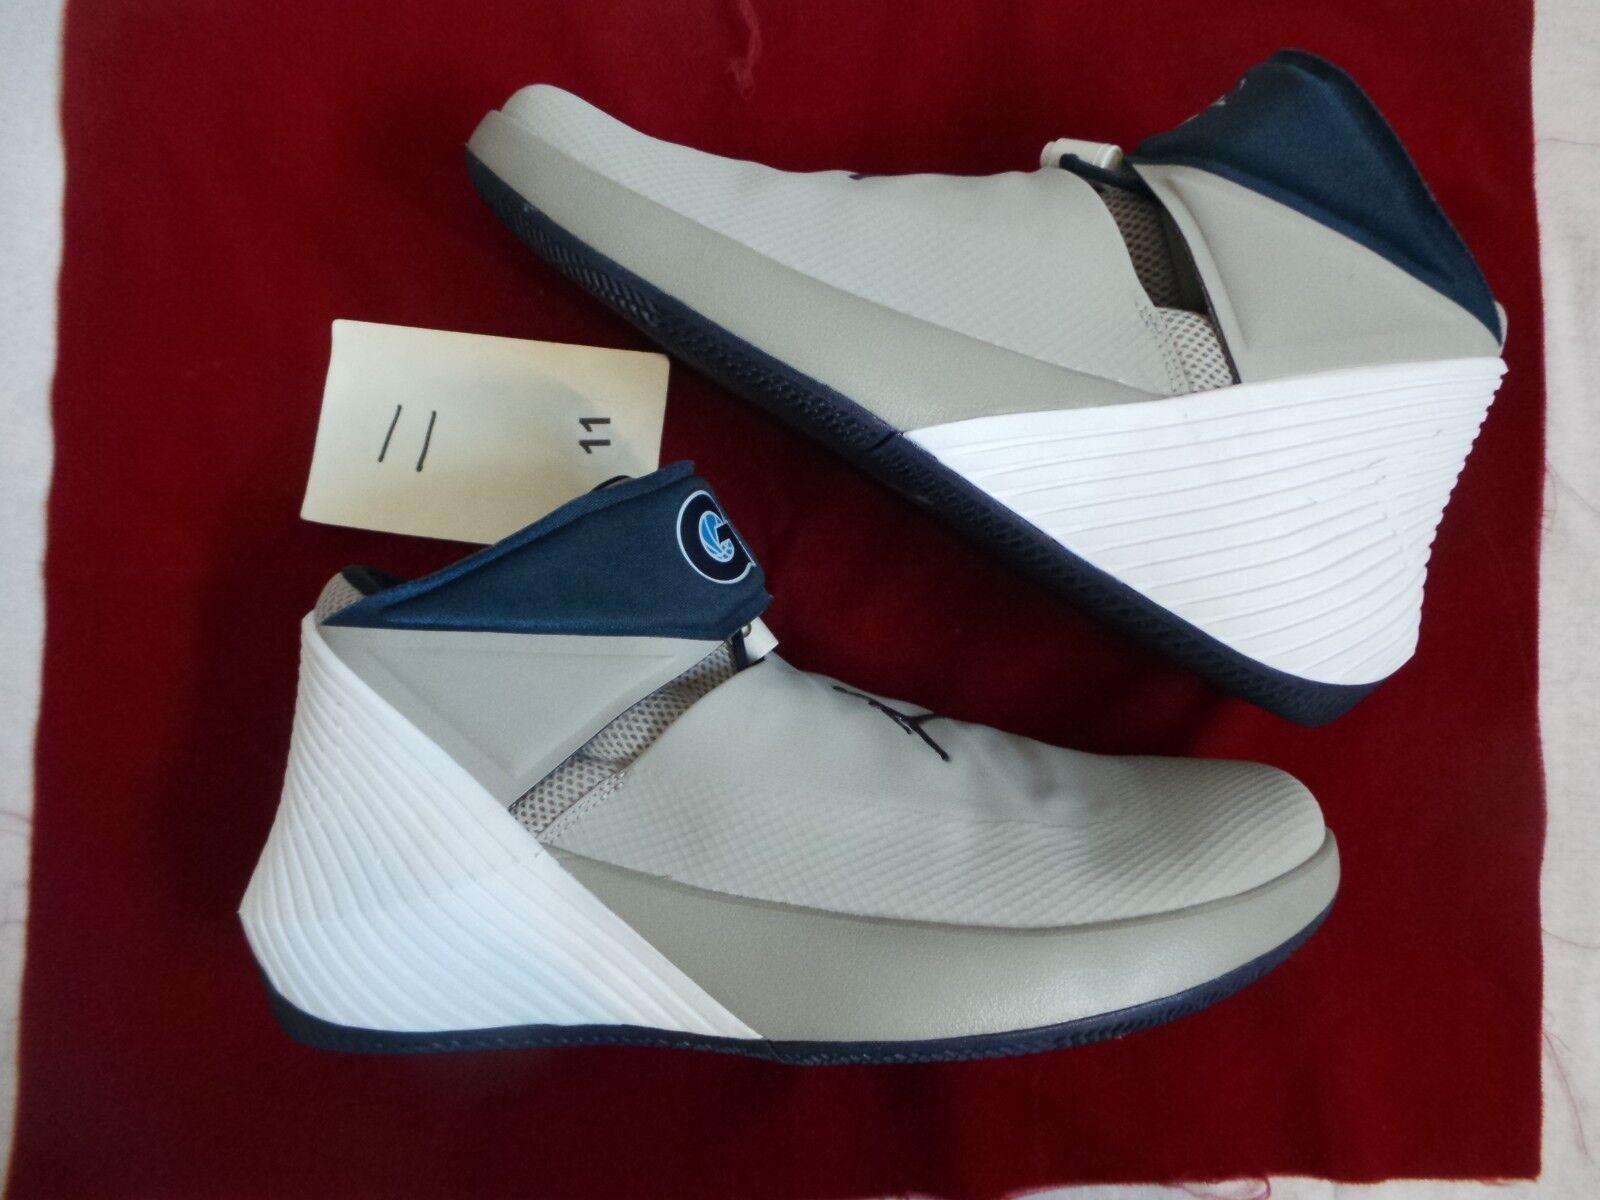 Nike Air Jordan Why Not Not? Westbrook zer0.1 GEORGETOWN Player Sample PE 11 DS